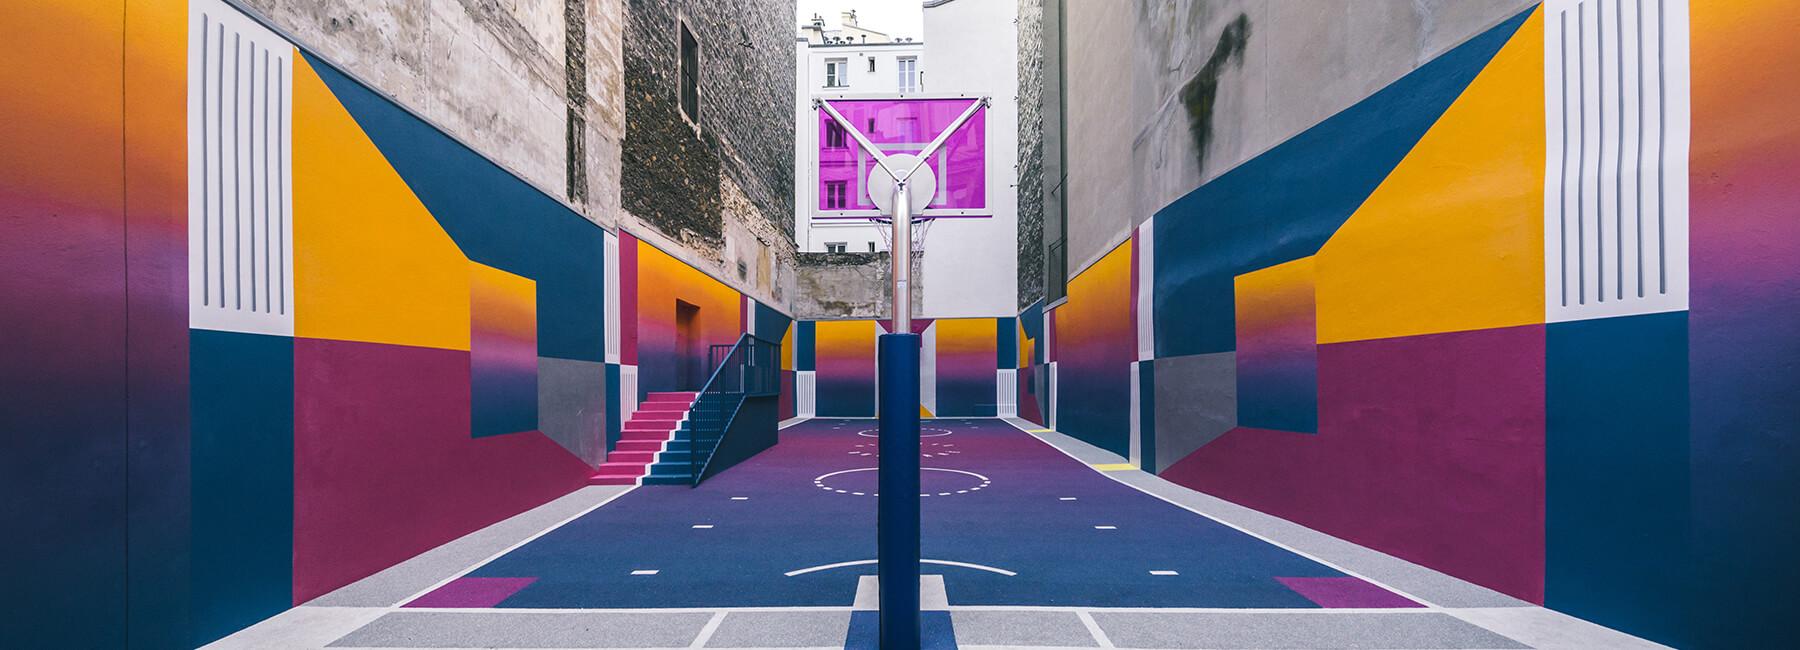 pigalle paris basketball court